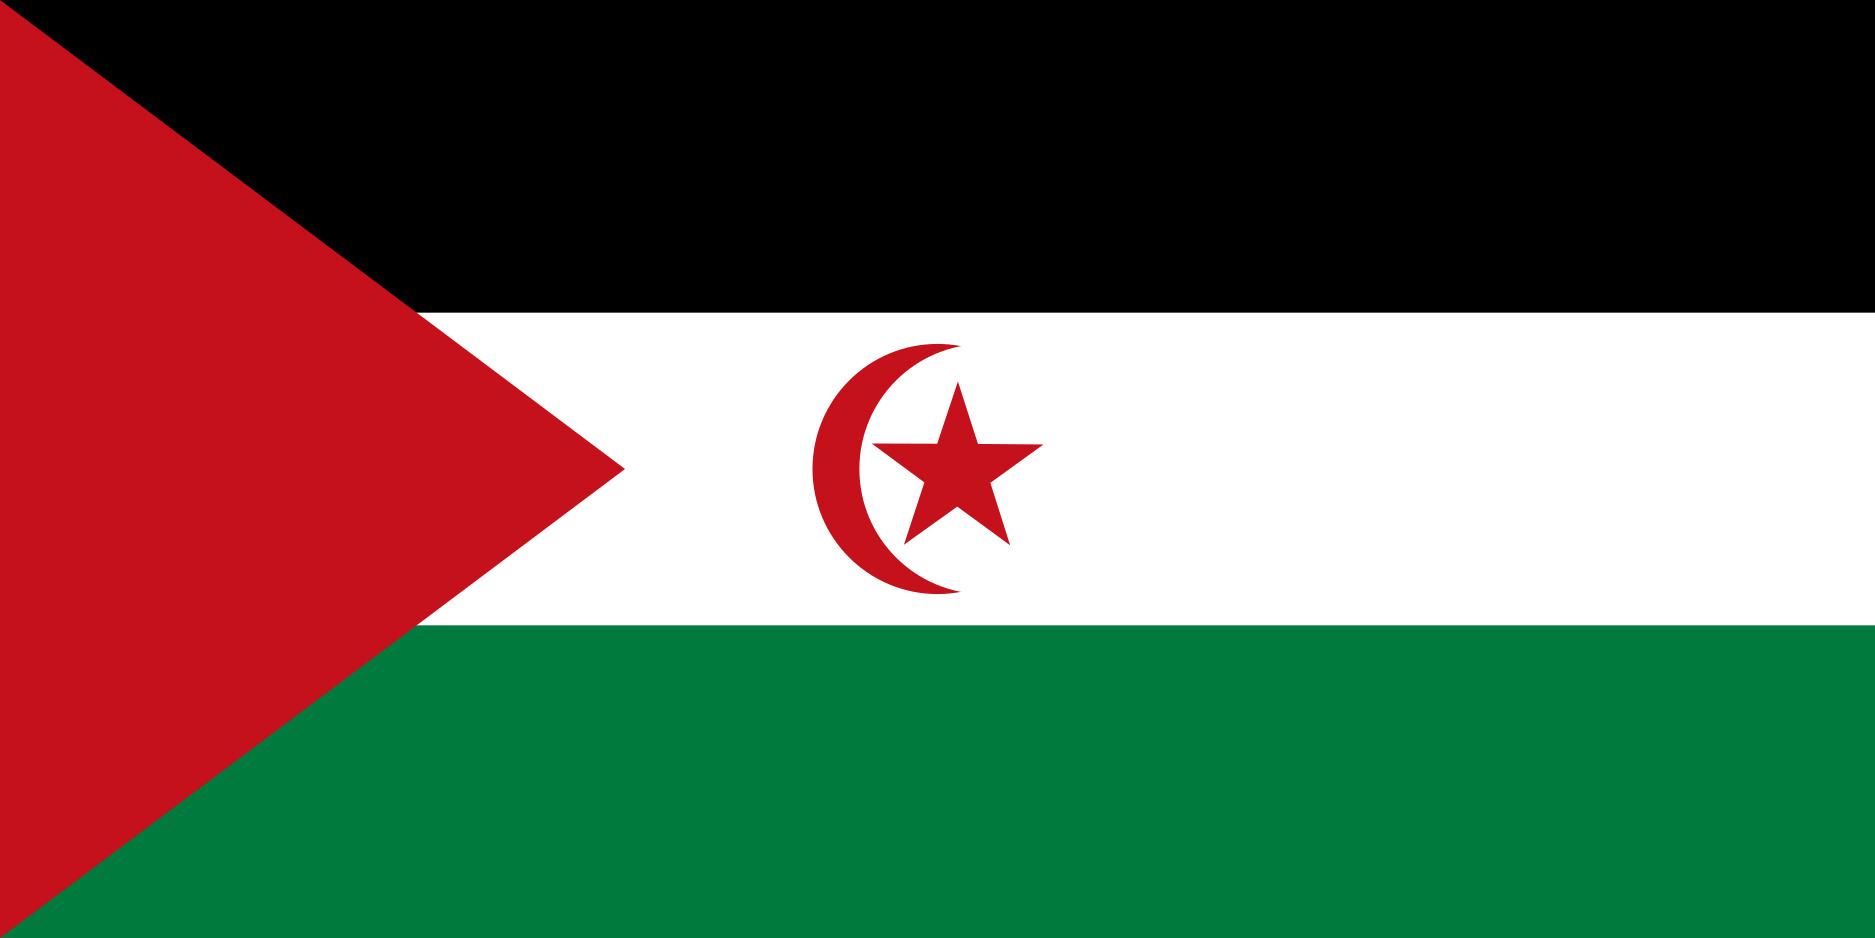 Sahrawi_Arab_Democratic_Republic Flag Colours